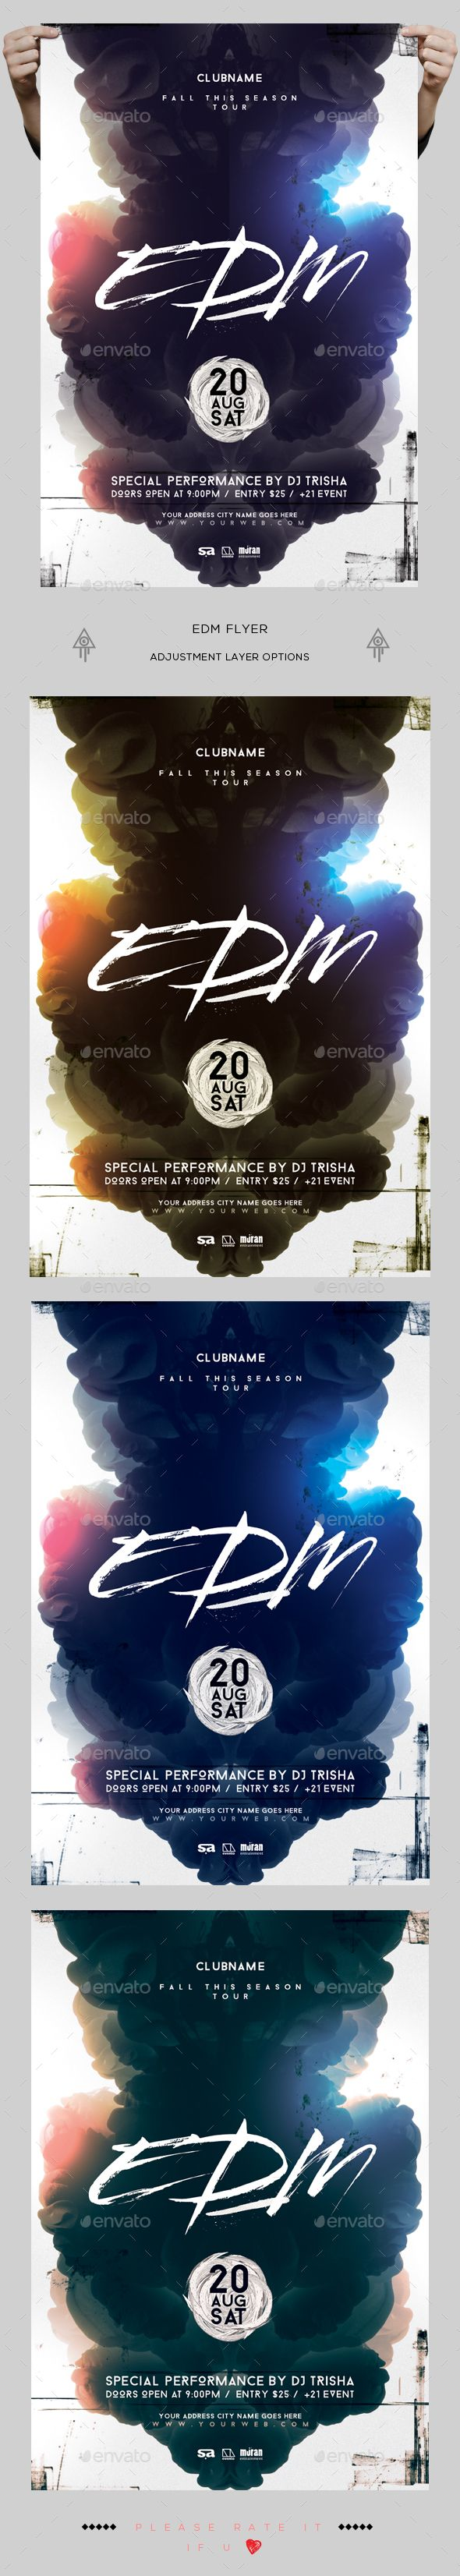 EDM Flyer — Photoshop PSD #nightclub #event • Download ➝ https://graphicriver.net/item/edm-flyer/18956298?ref=pxcr